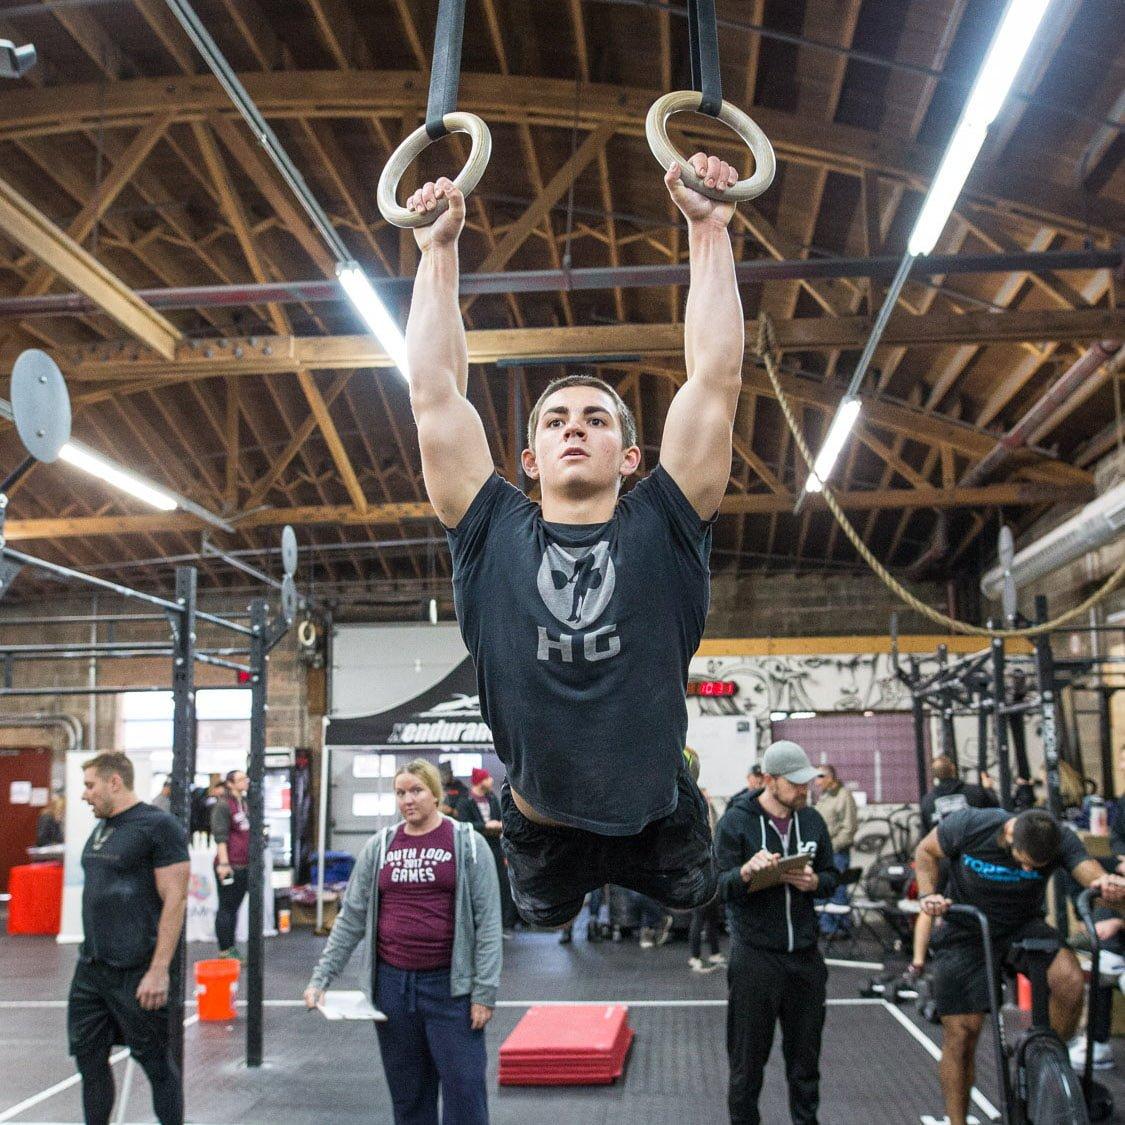 George Sterner Muscle-Up